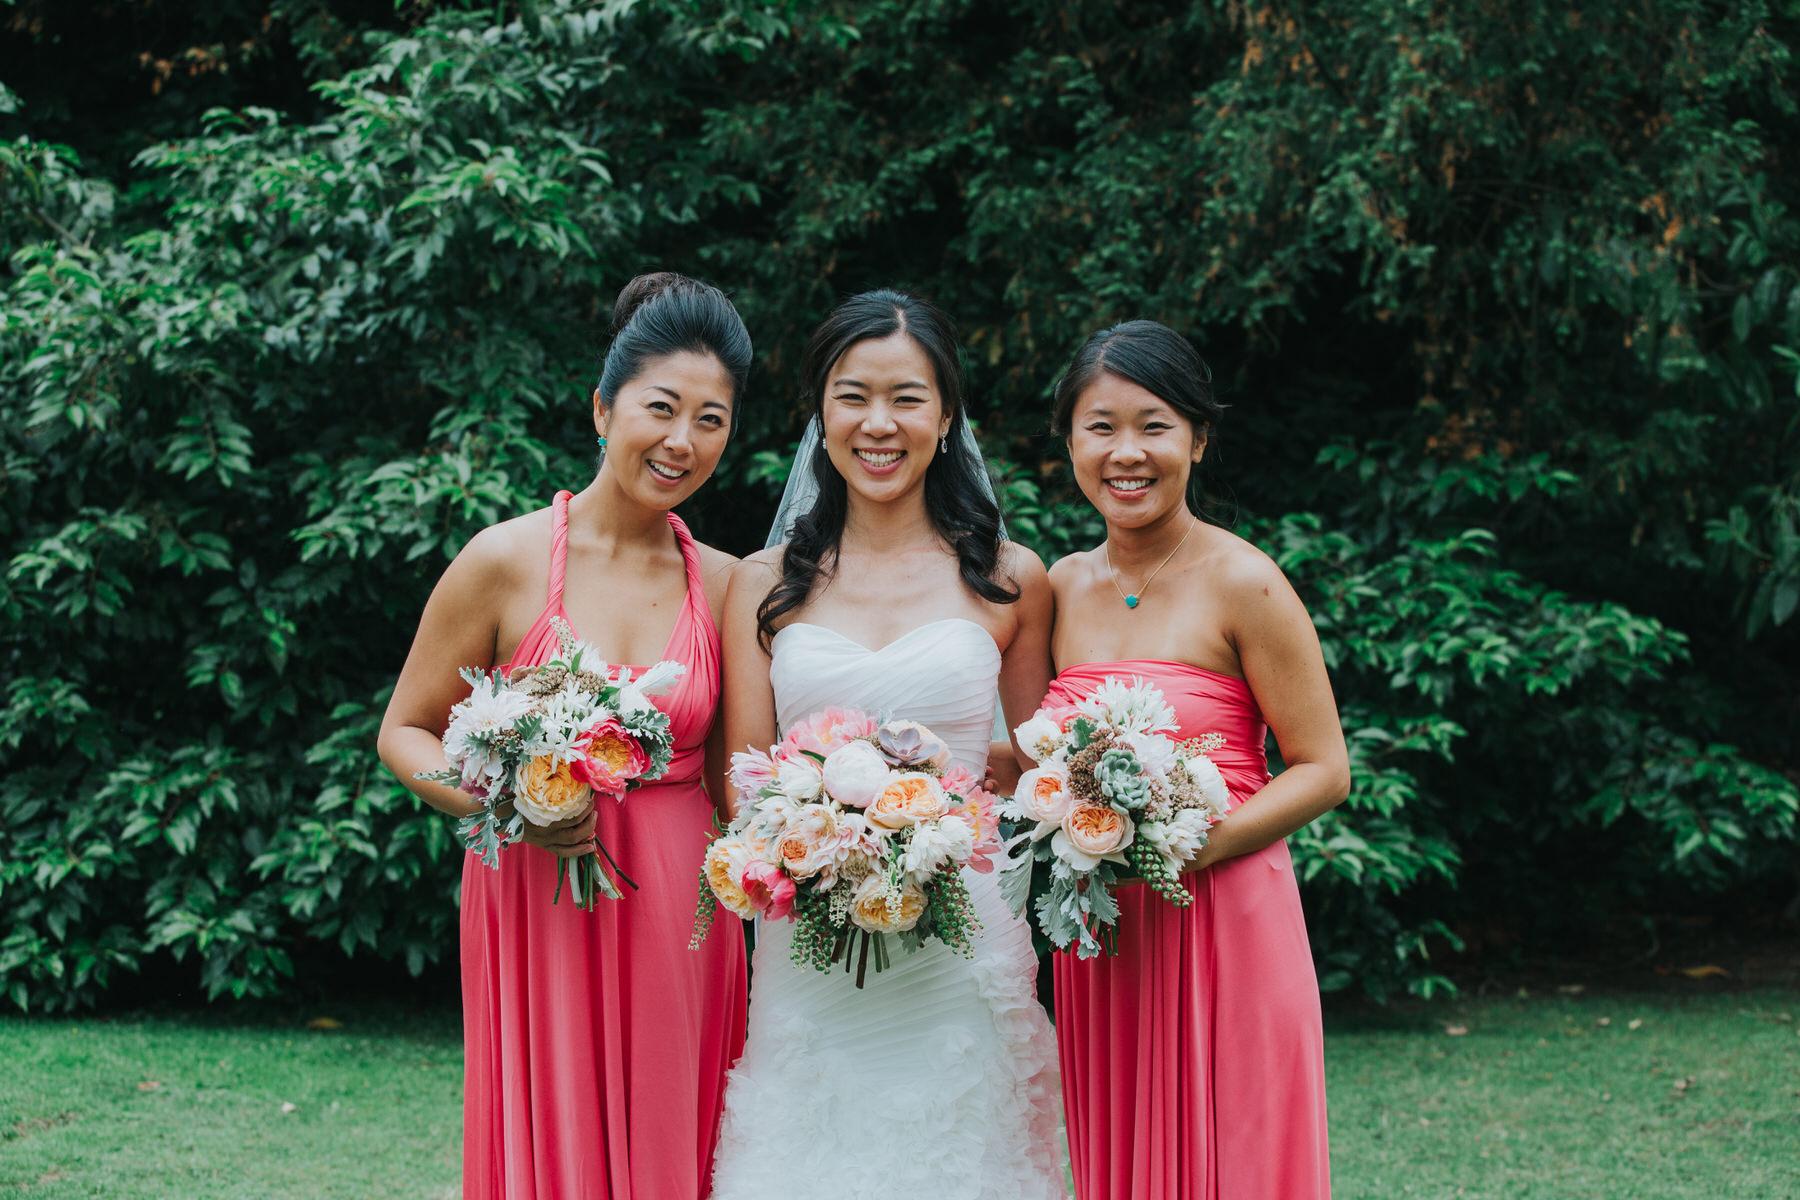 356 bridesmaids pink dress bride portrait reportage wedding photographer.jpg